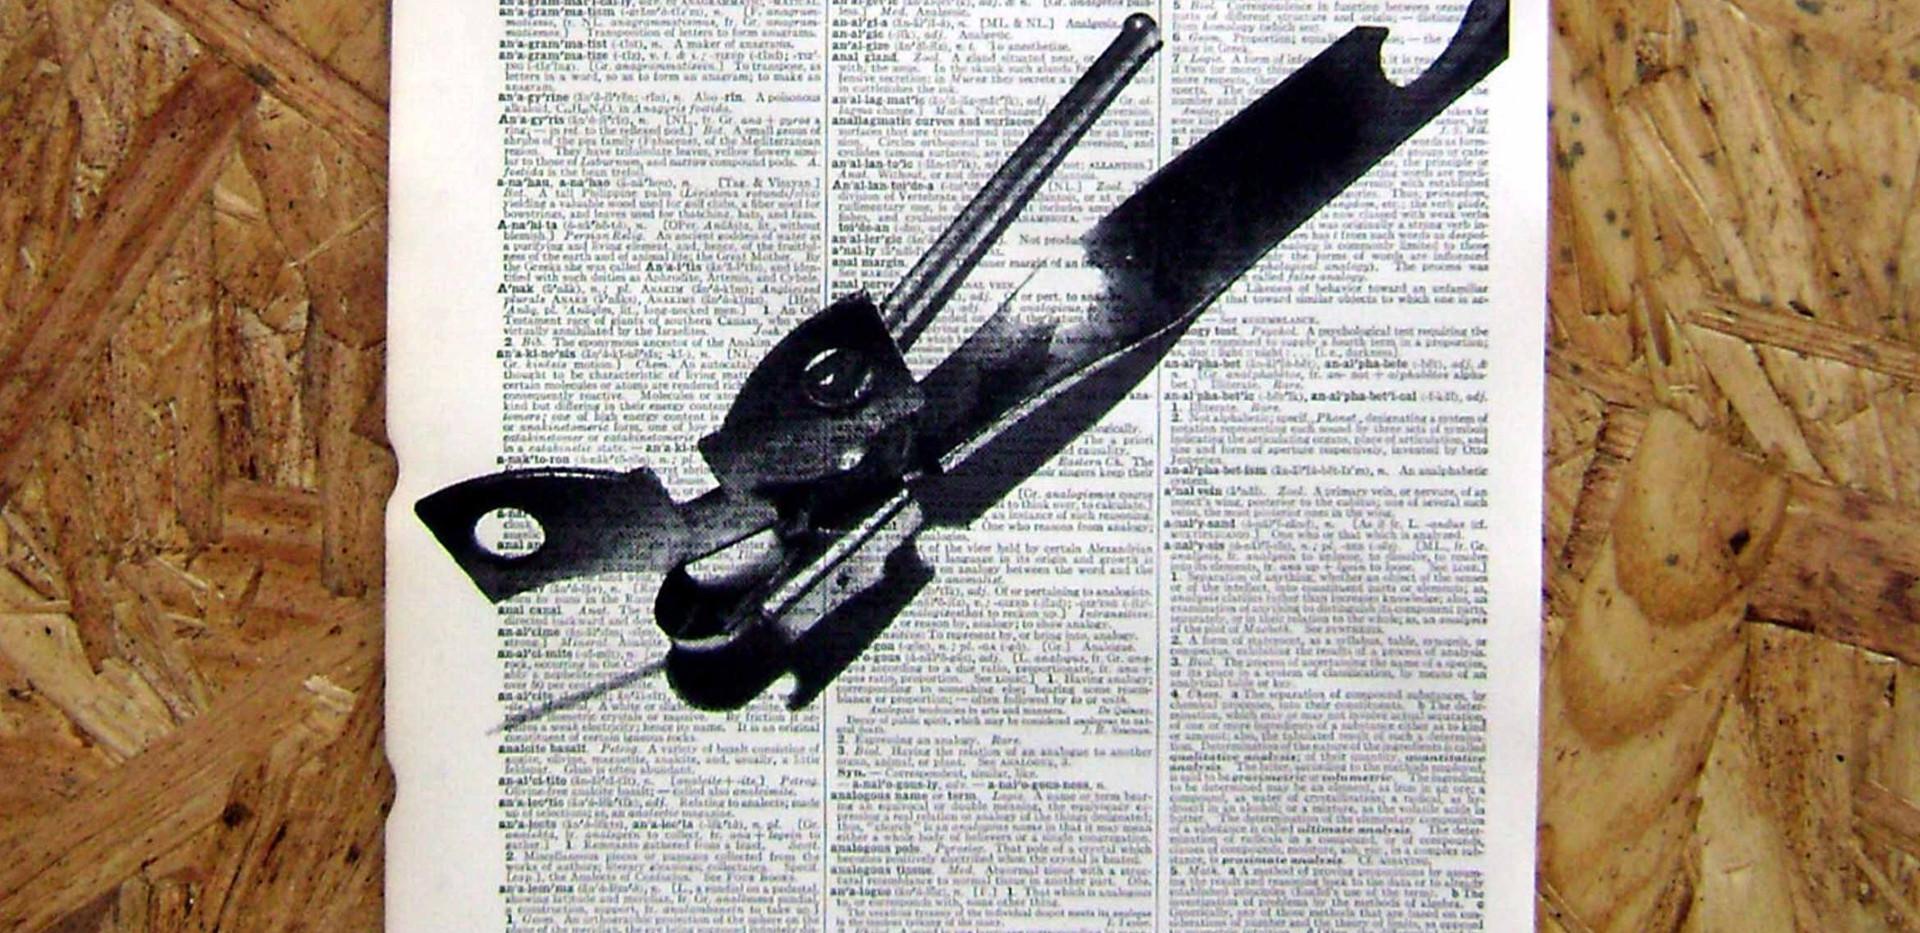 Common Object - Utilitarian 3